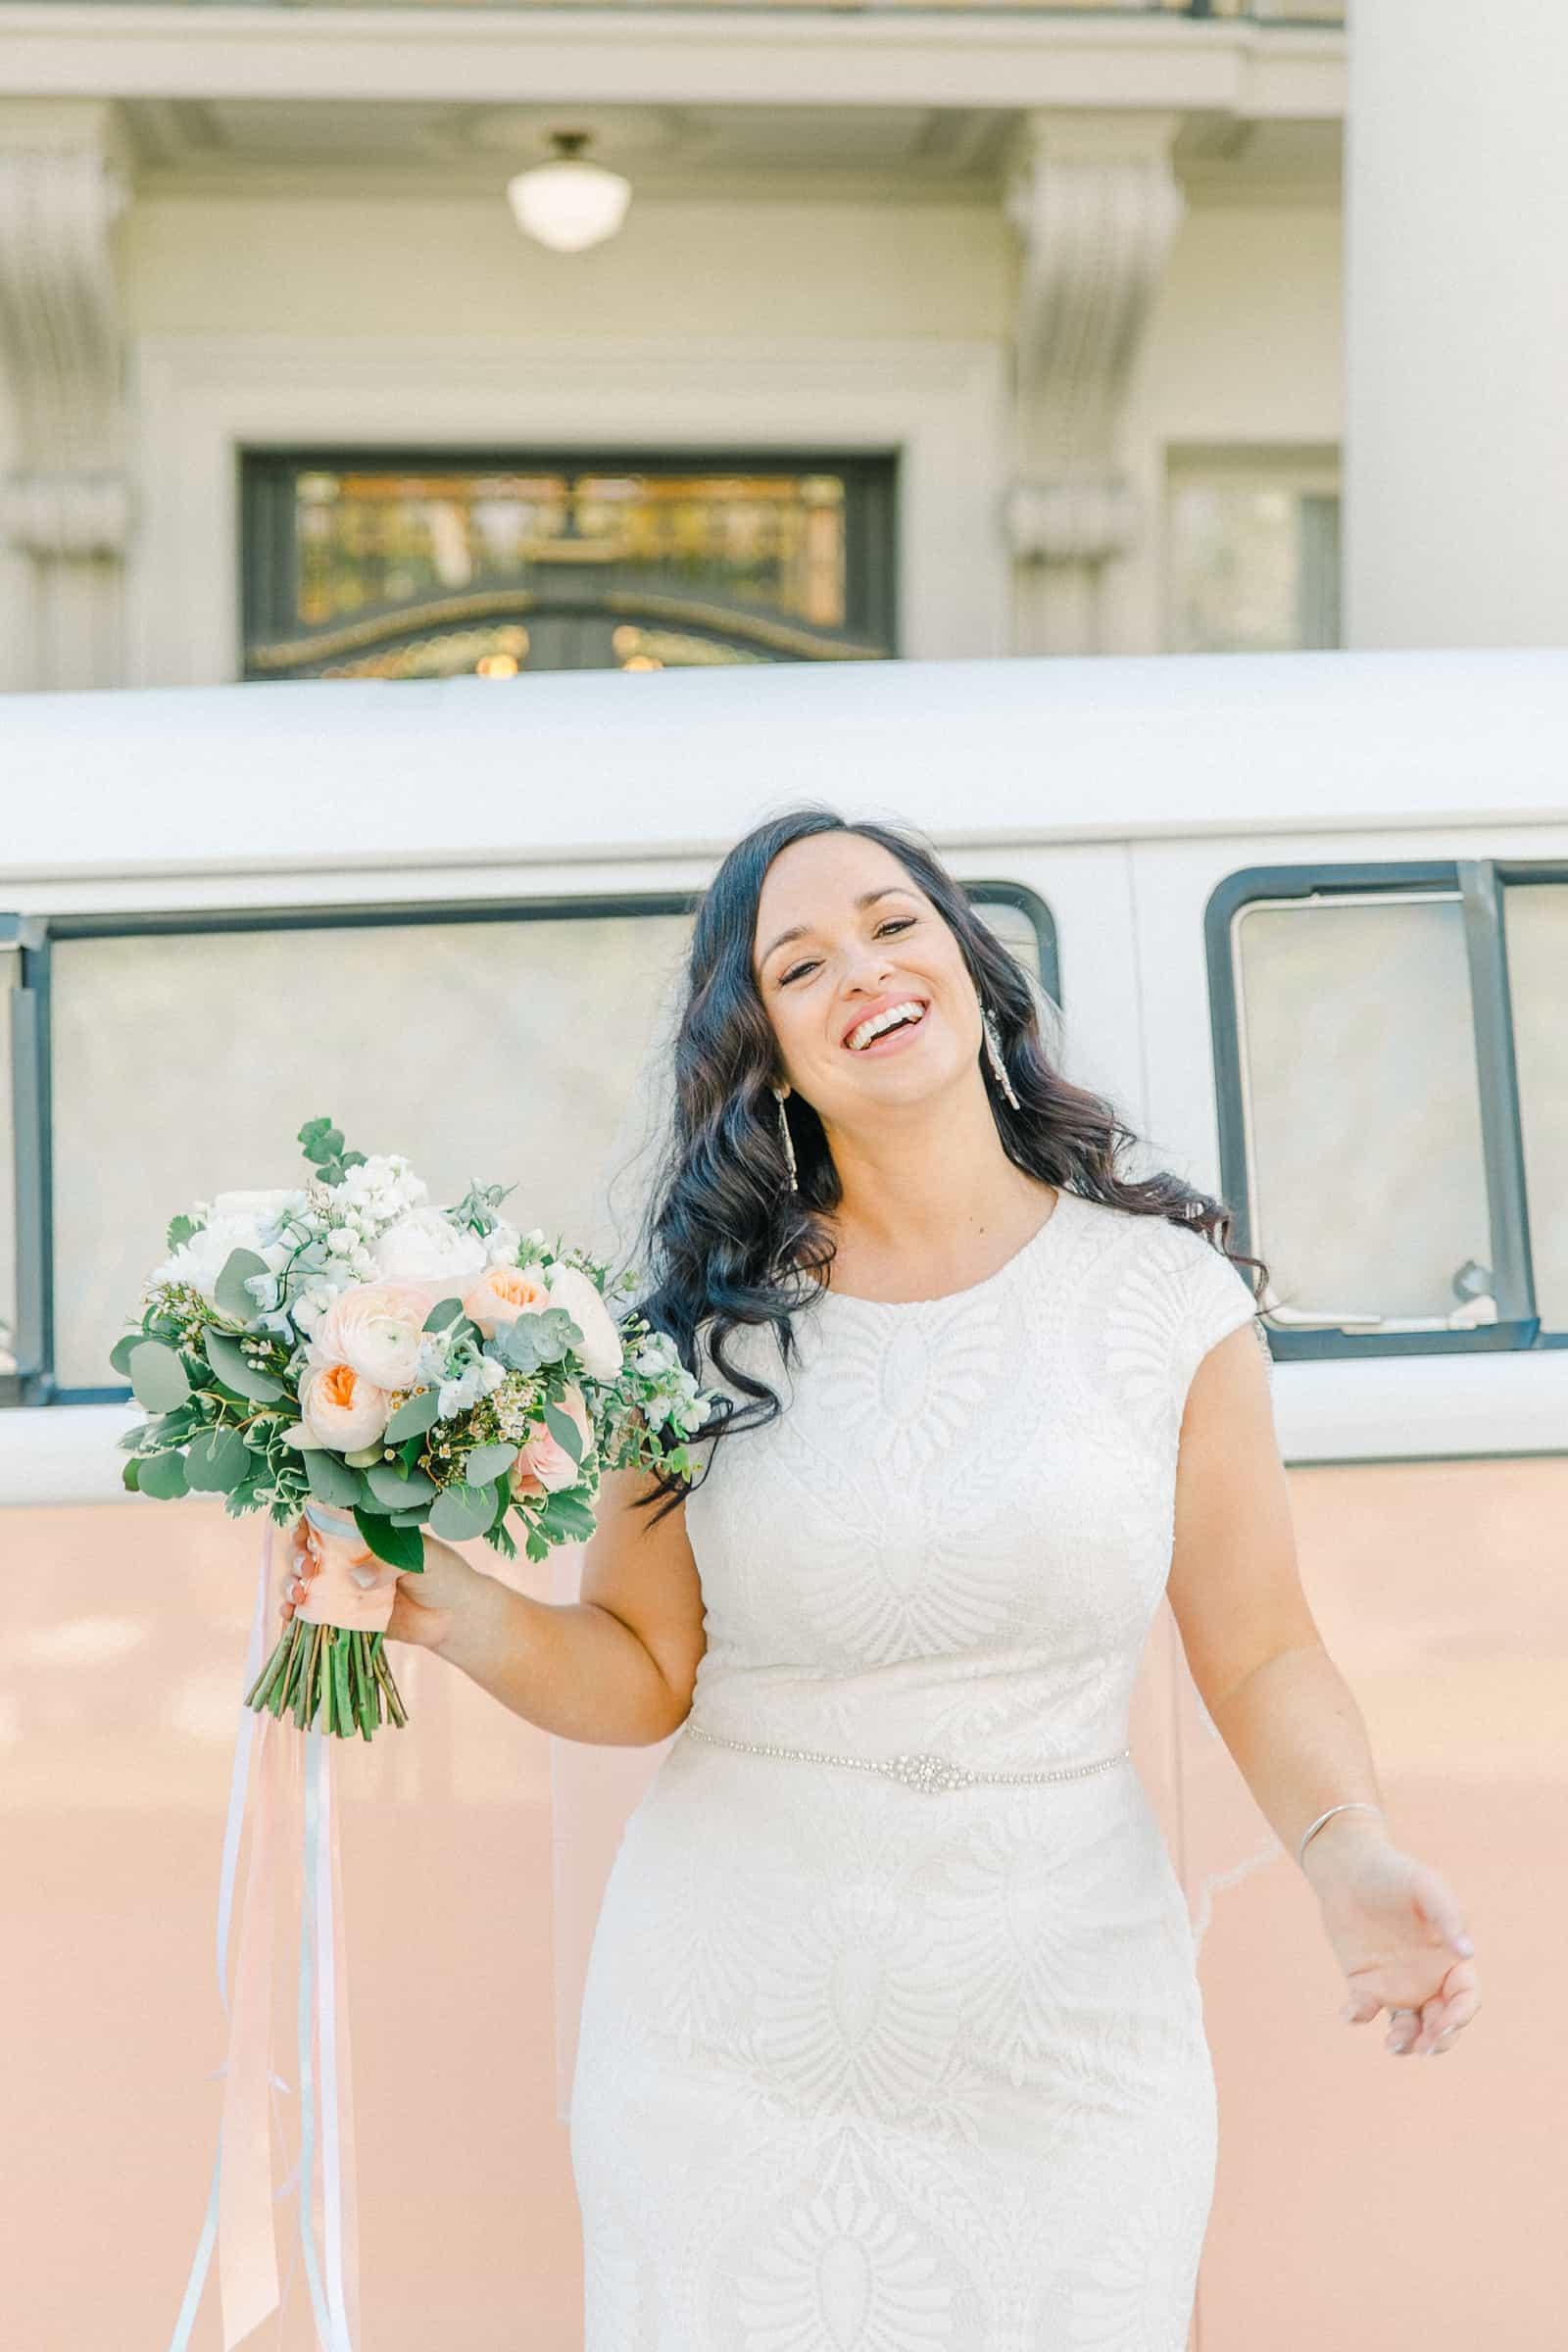 Thomas S. Monson Center Wedding, Salt Lake LDS Temple Wedding, Utah wedding photography. bride with vintage pink VW photo bus